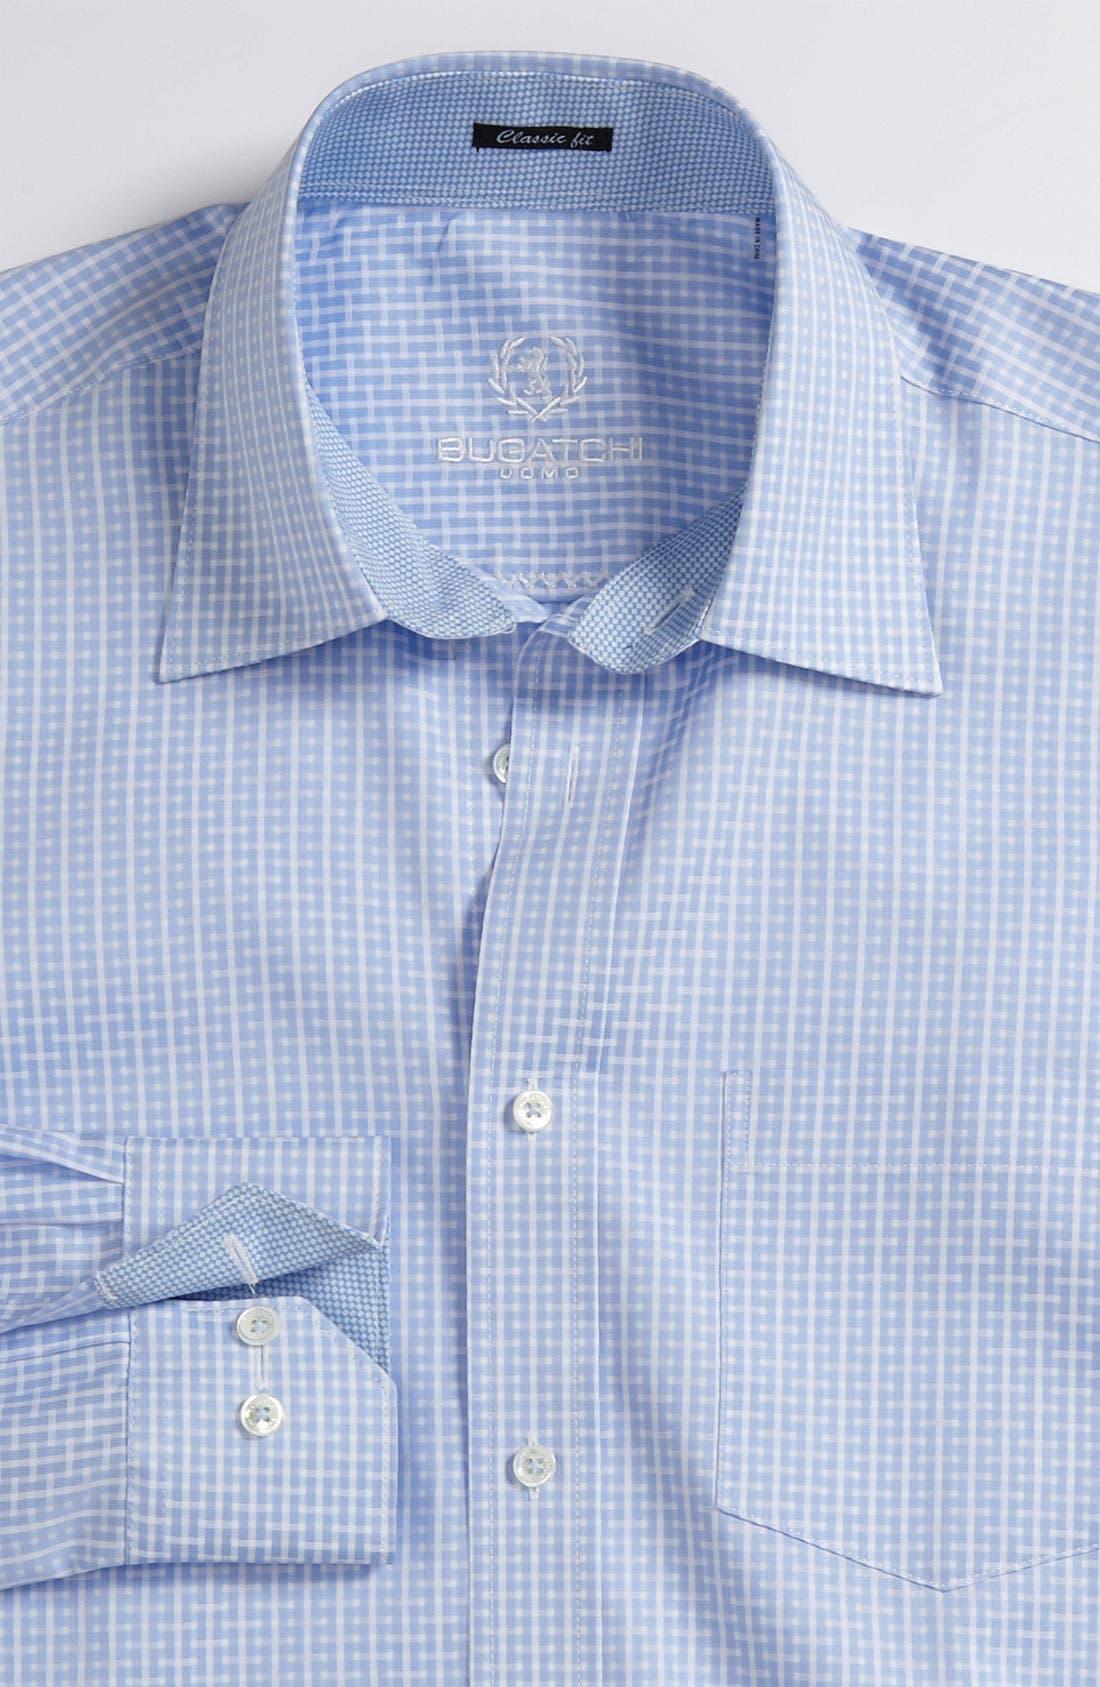 Main Image - Bugatchi Uomo Classic Fit Sport Shirt